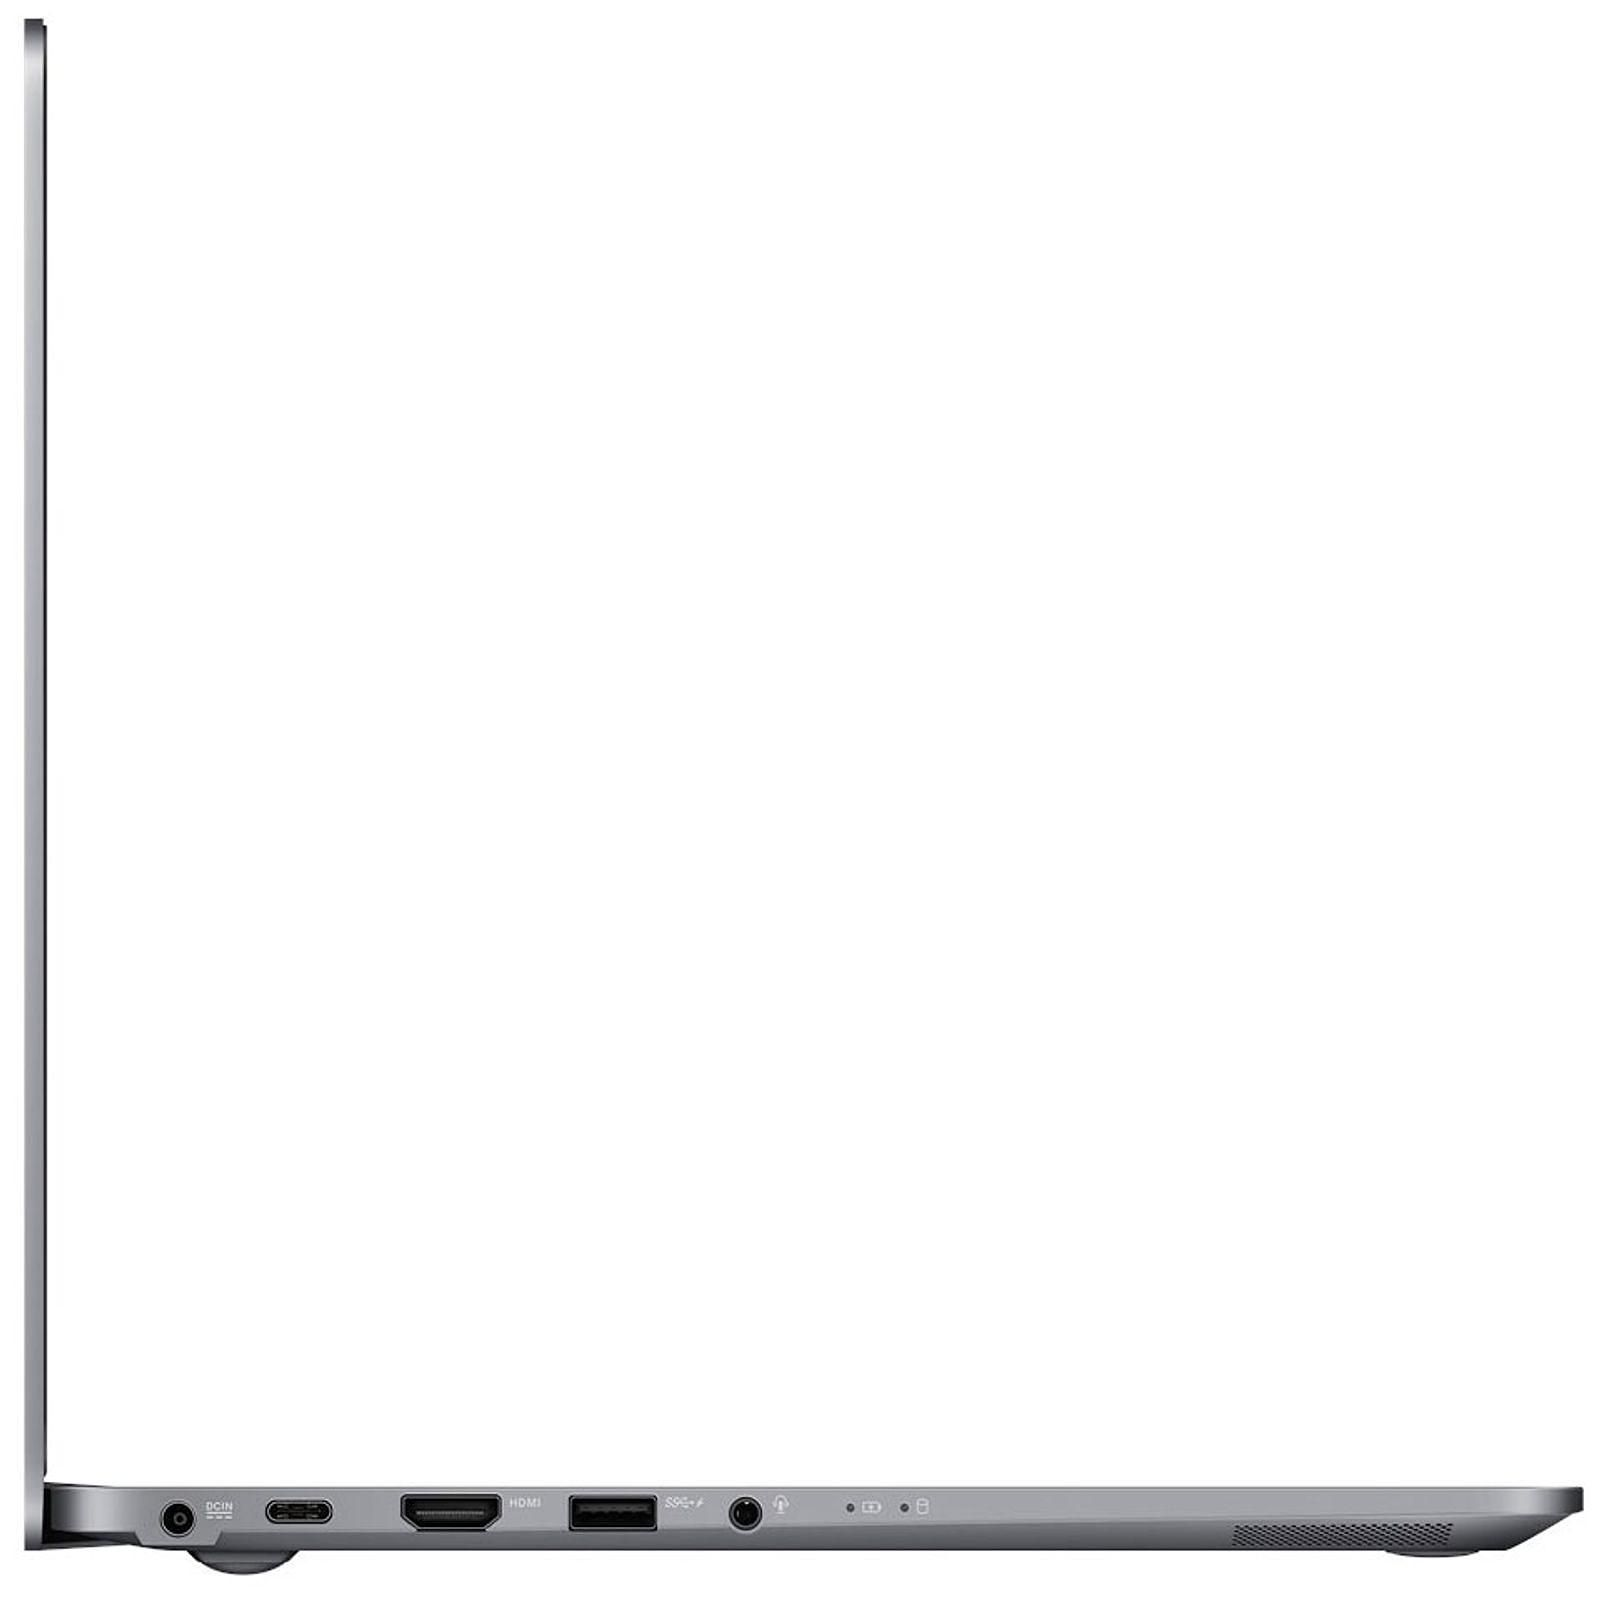 Asus 90NX01X1-M07820 - PC portable Asus - Cybertek.fr - 2